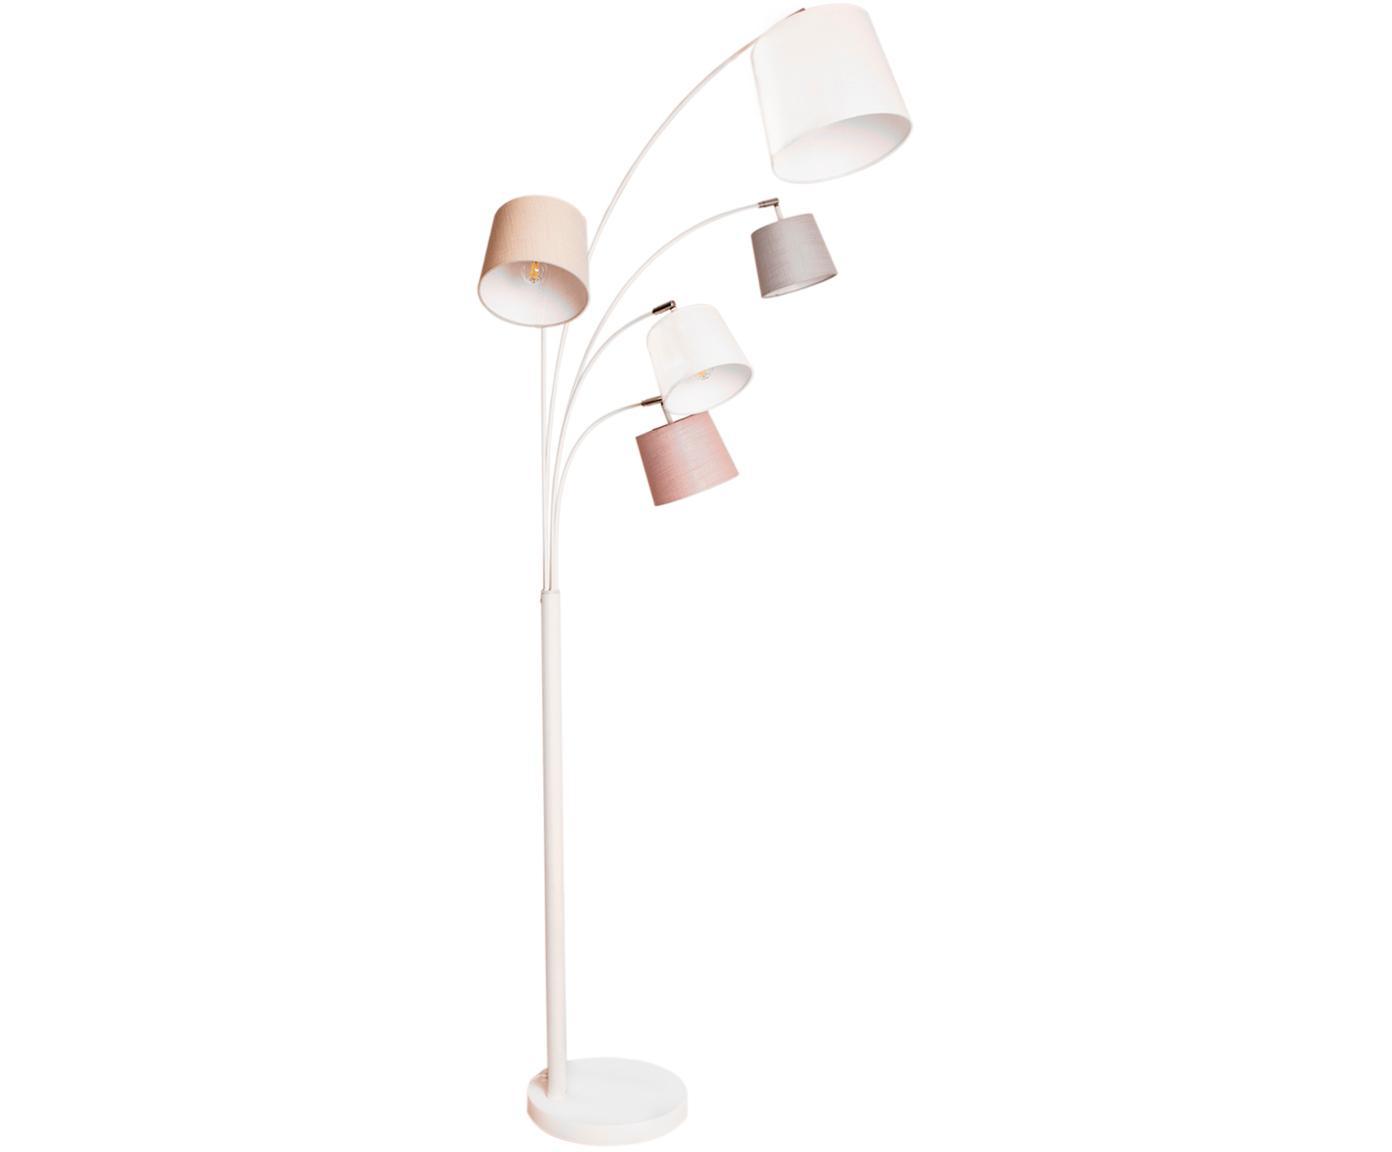 Stehlampe Foggy, Lampenschirm: Polyester, Baumwolle, Lampenfuß: Metall, lackiert, Weiß, Grau, Rosa, 80 x 200 cm